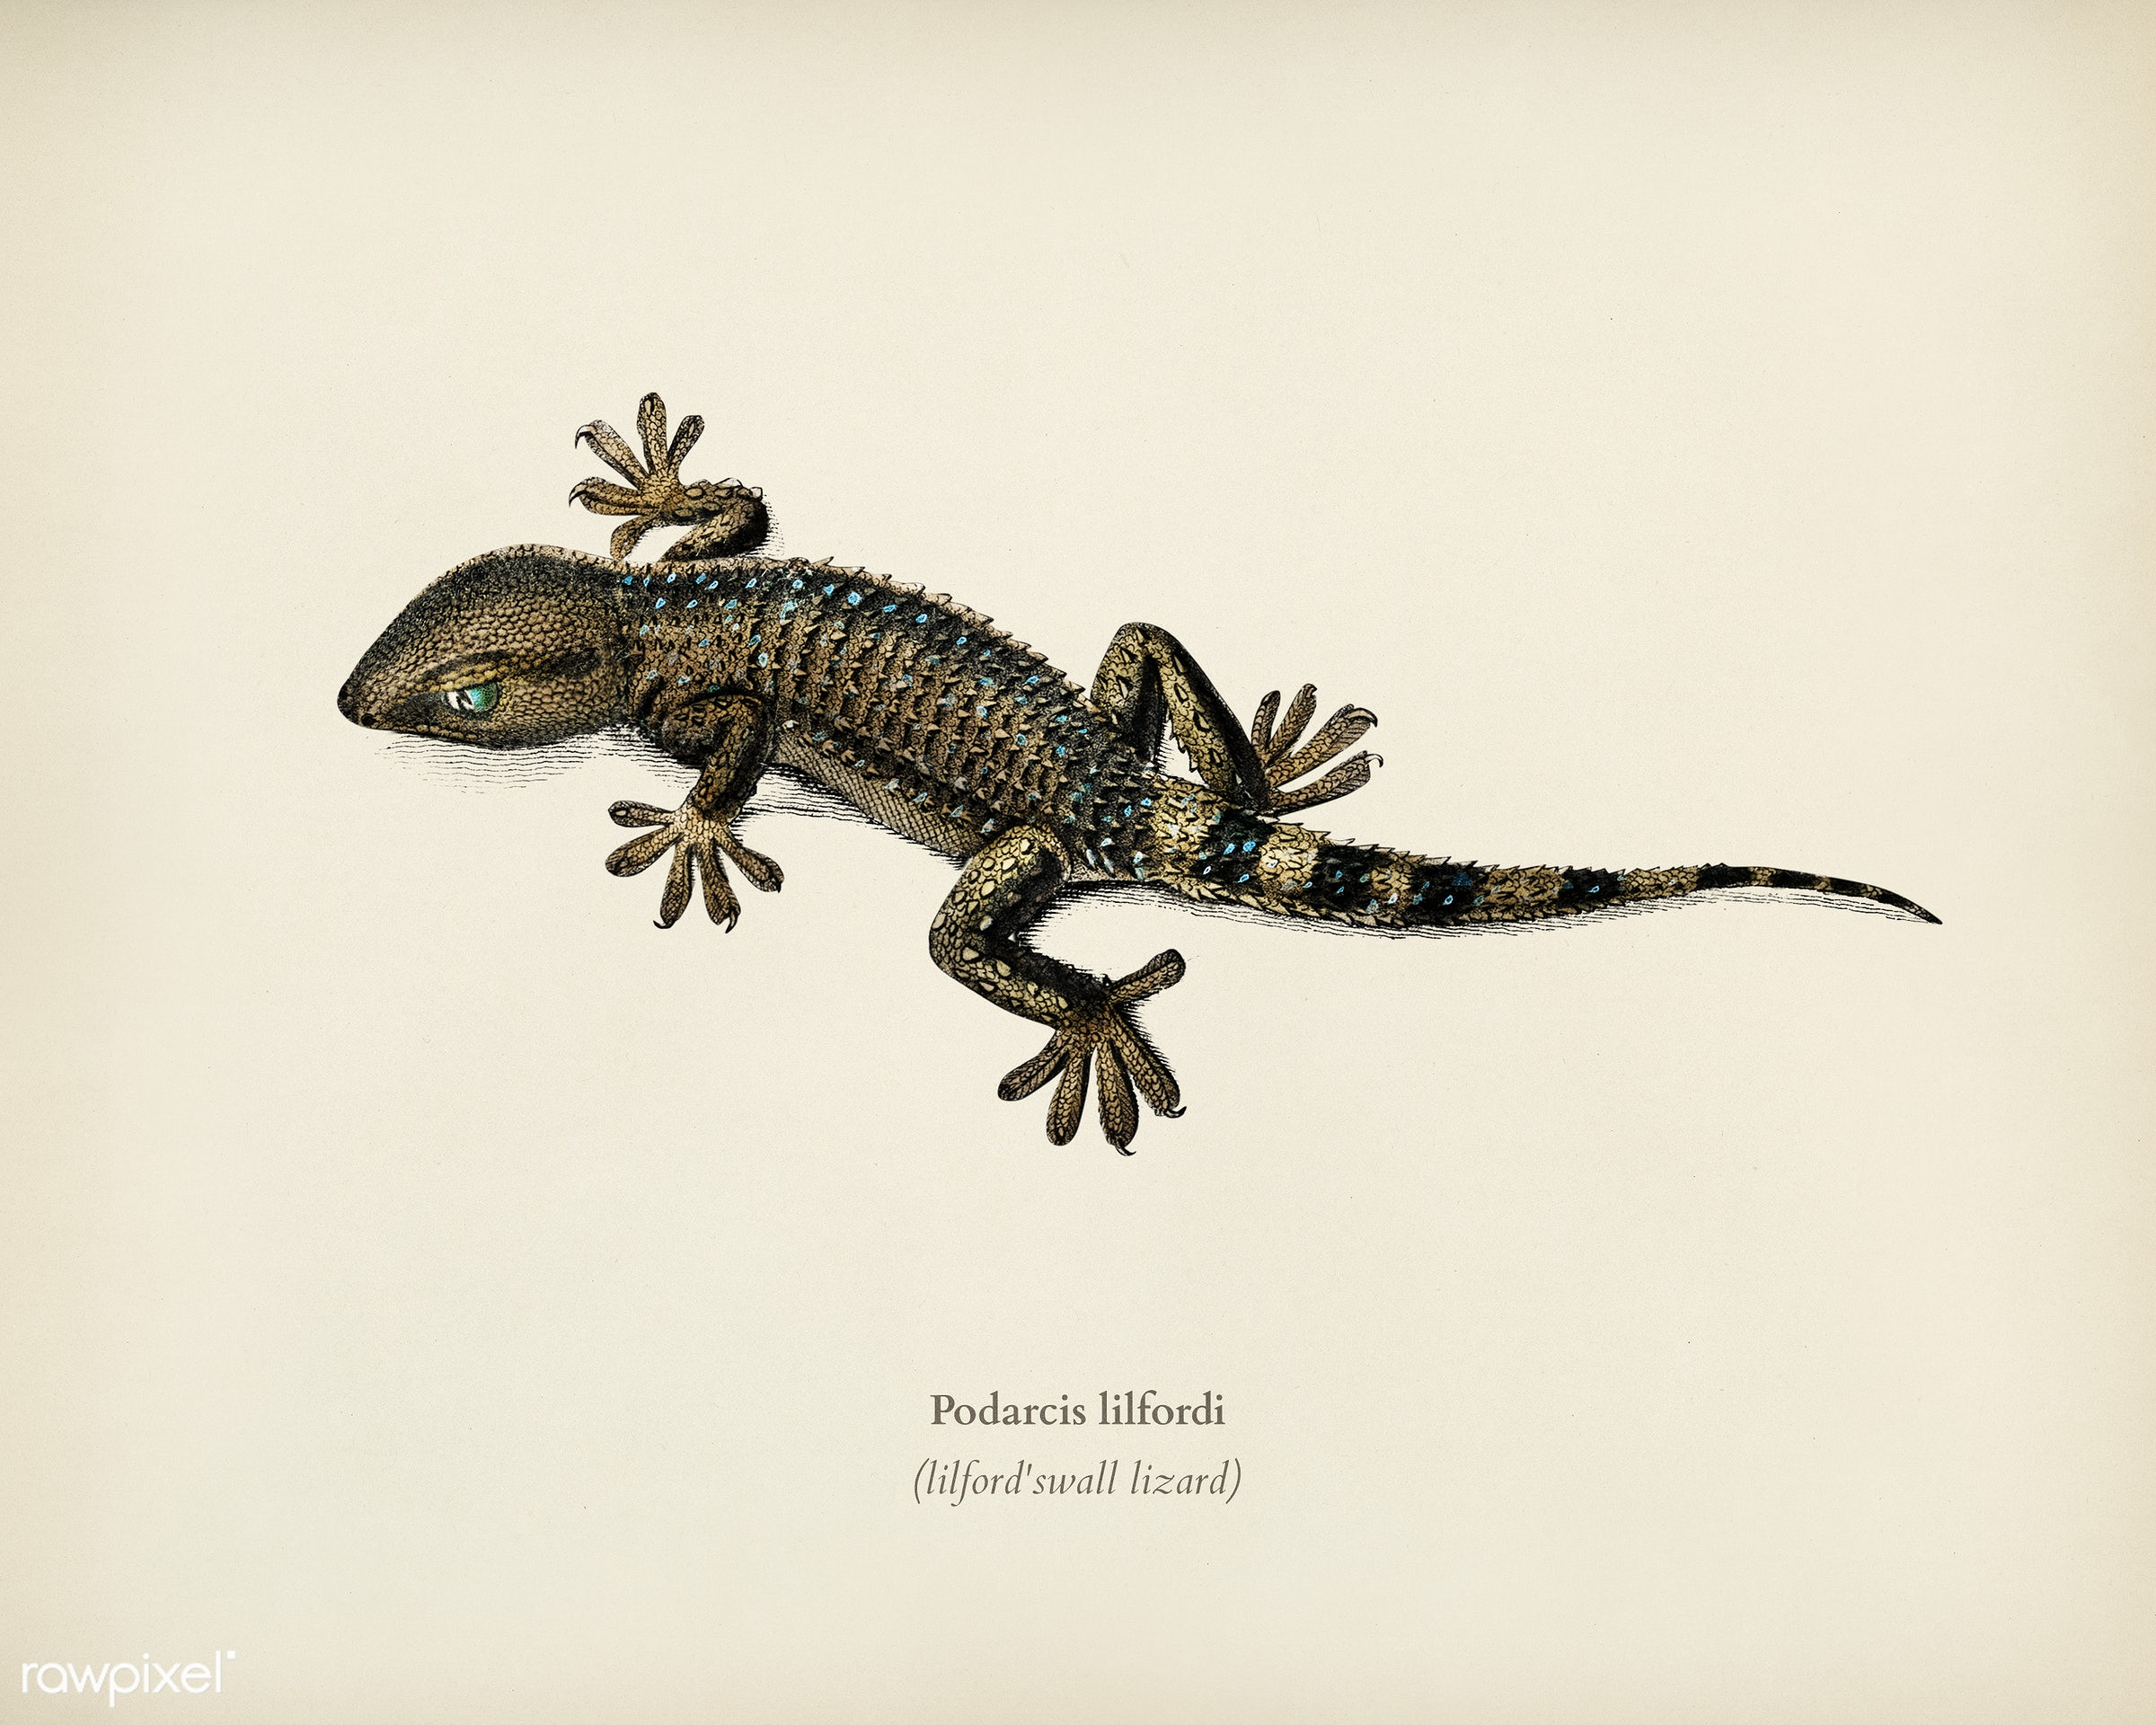 Lilford'swall lizard (Podarcis lilfordi) illustrated by Charles Dessalines D' Orbigny (1806-1876). Digitally...